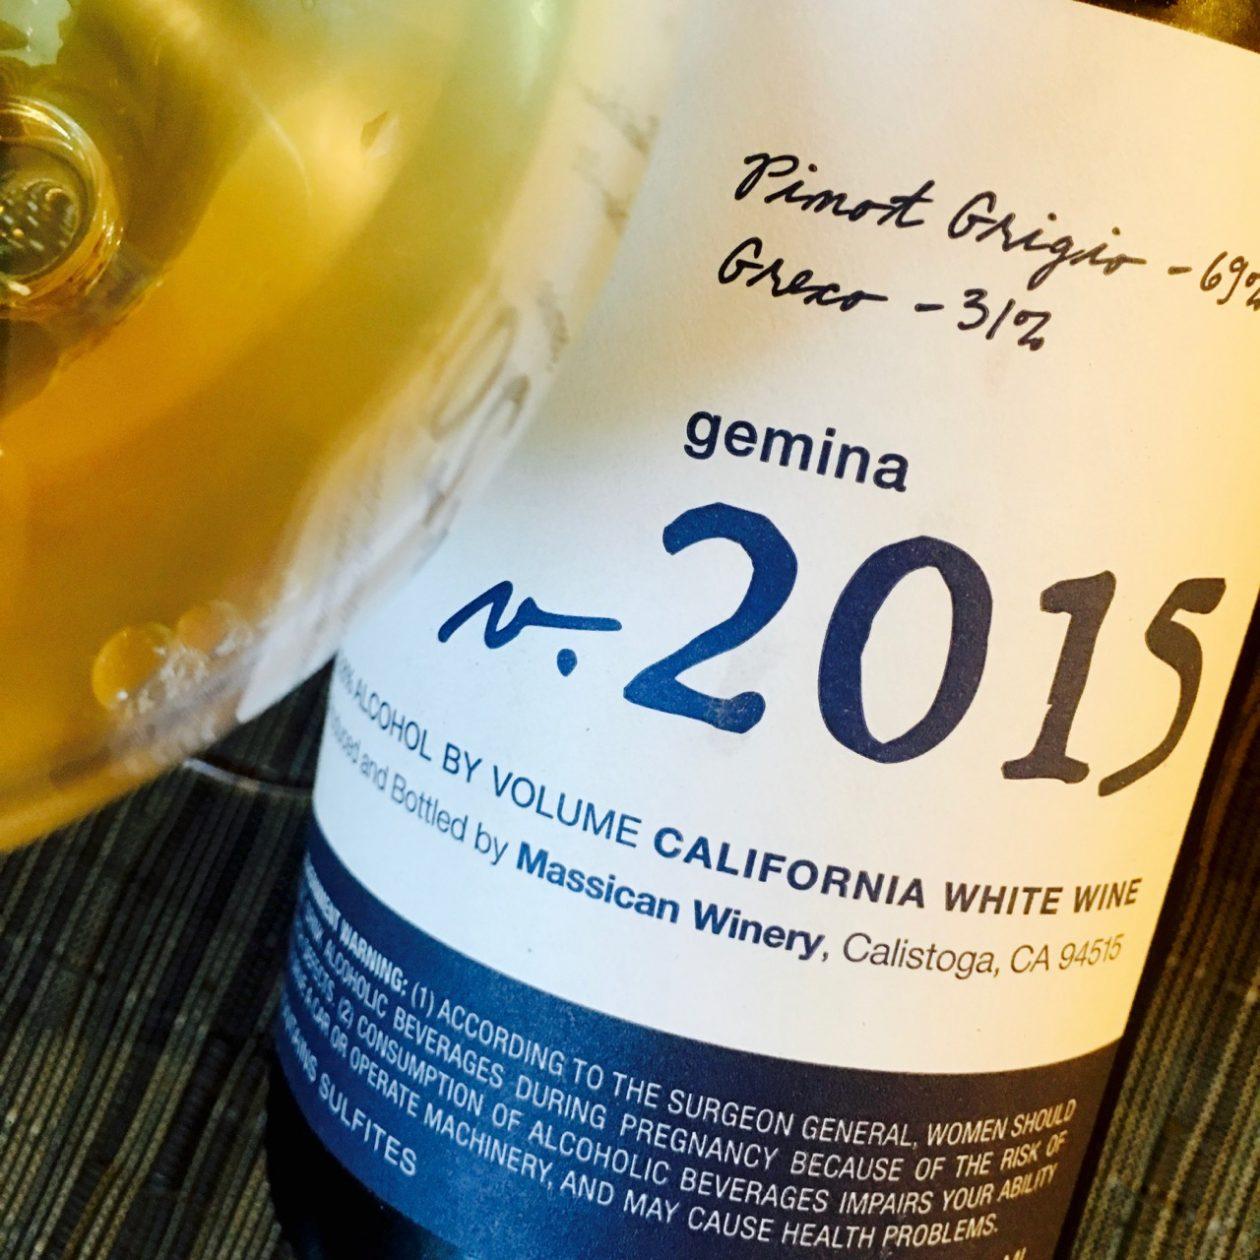 2015 Massican White Blend Gemina California